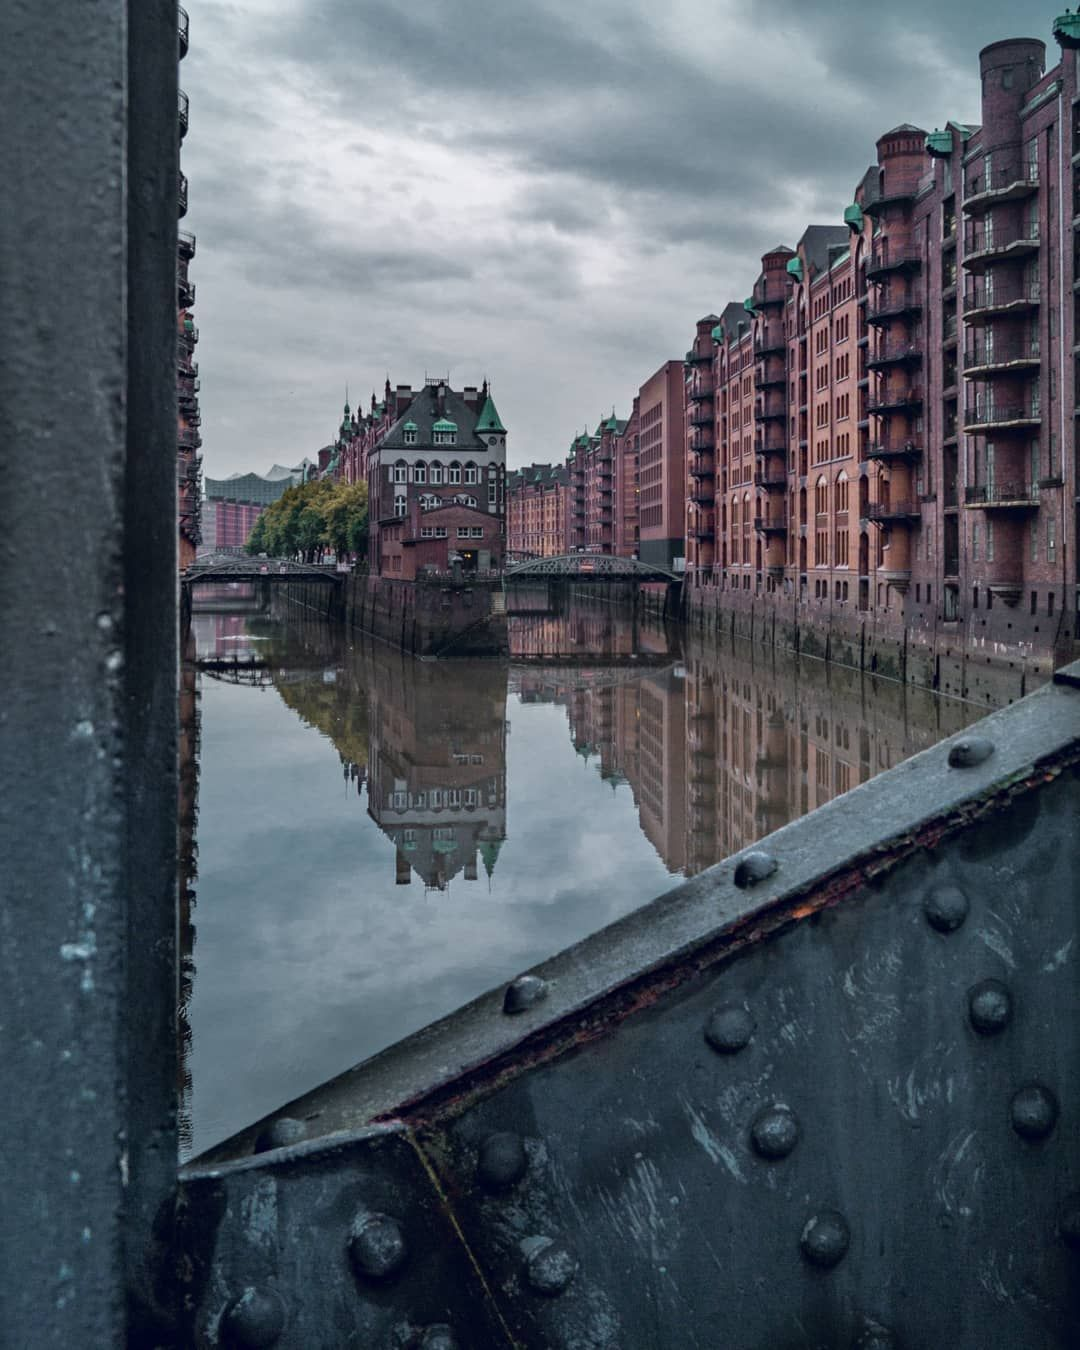 Thilo Schmidt On Instagram Right Time Right Place Classic Hamburg Igershamburg Urbanfotography Welovehh Hamburgfotografiert Instagram Travel Hamburg